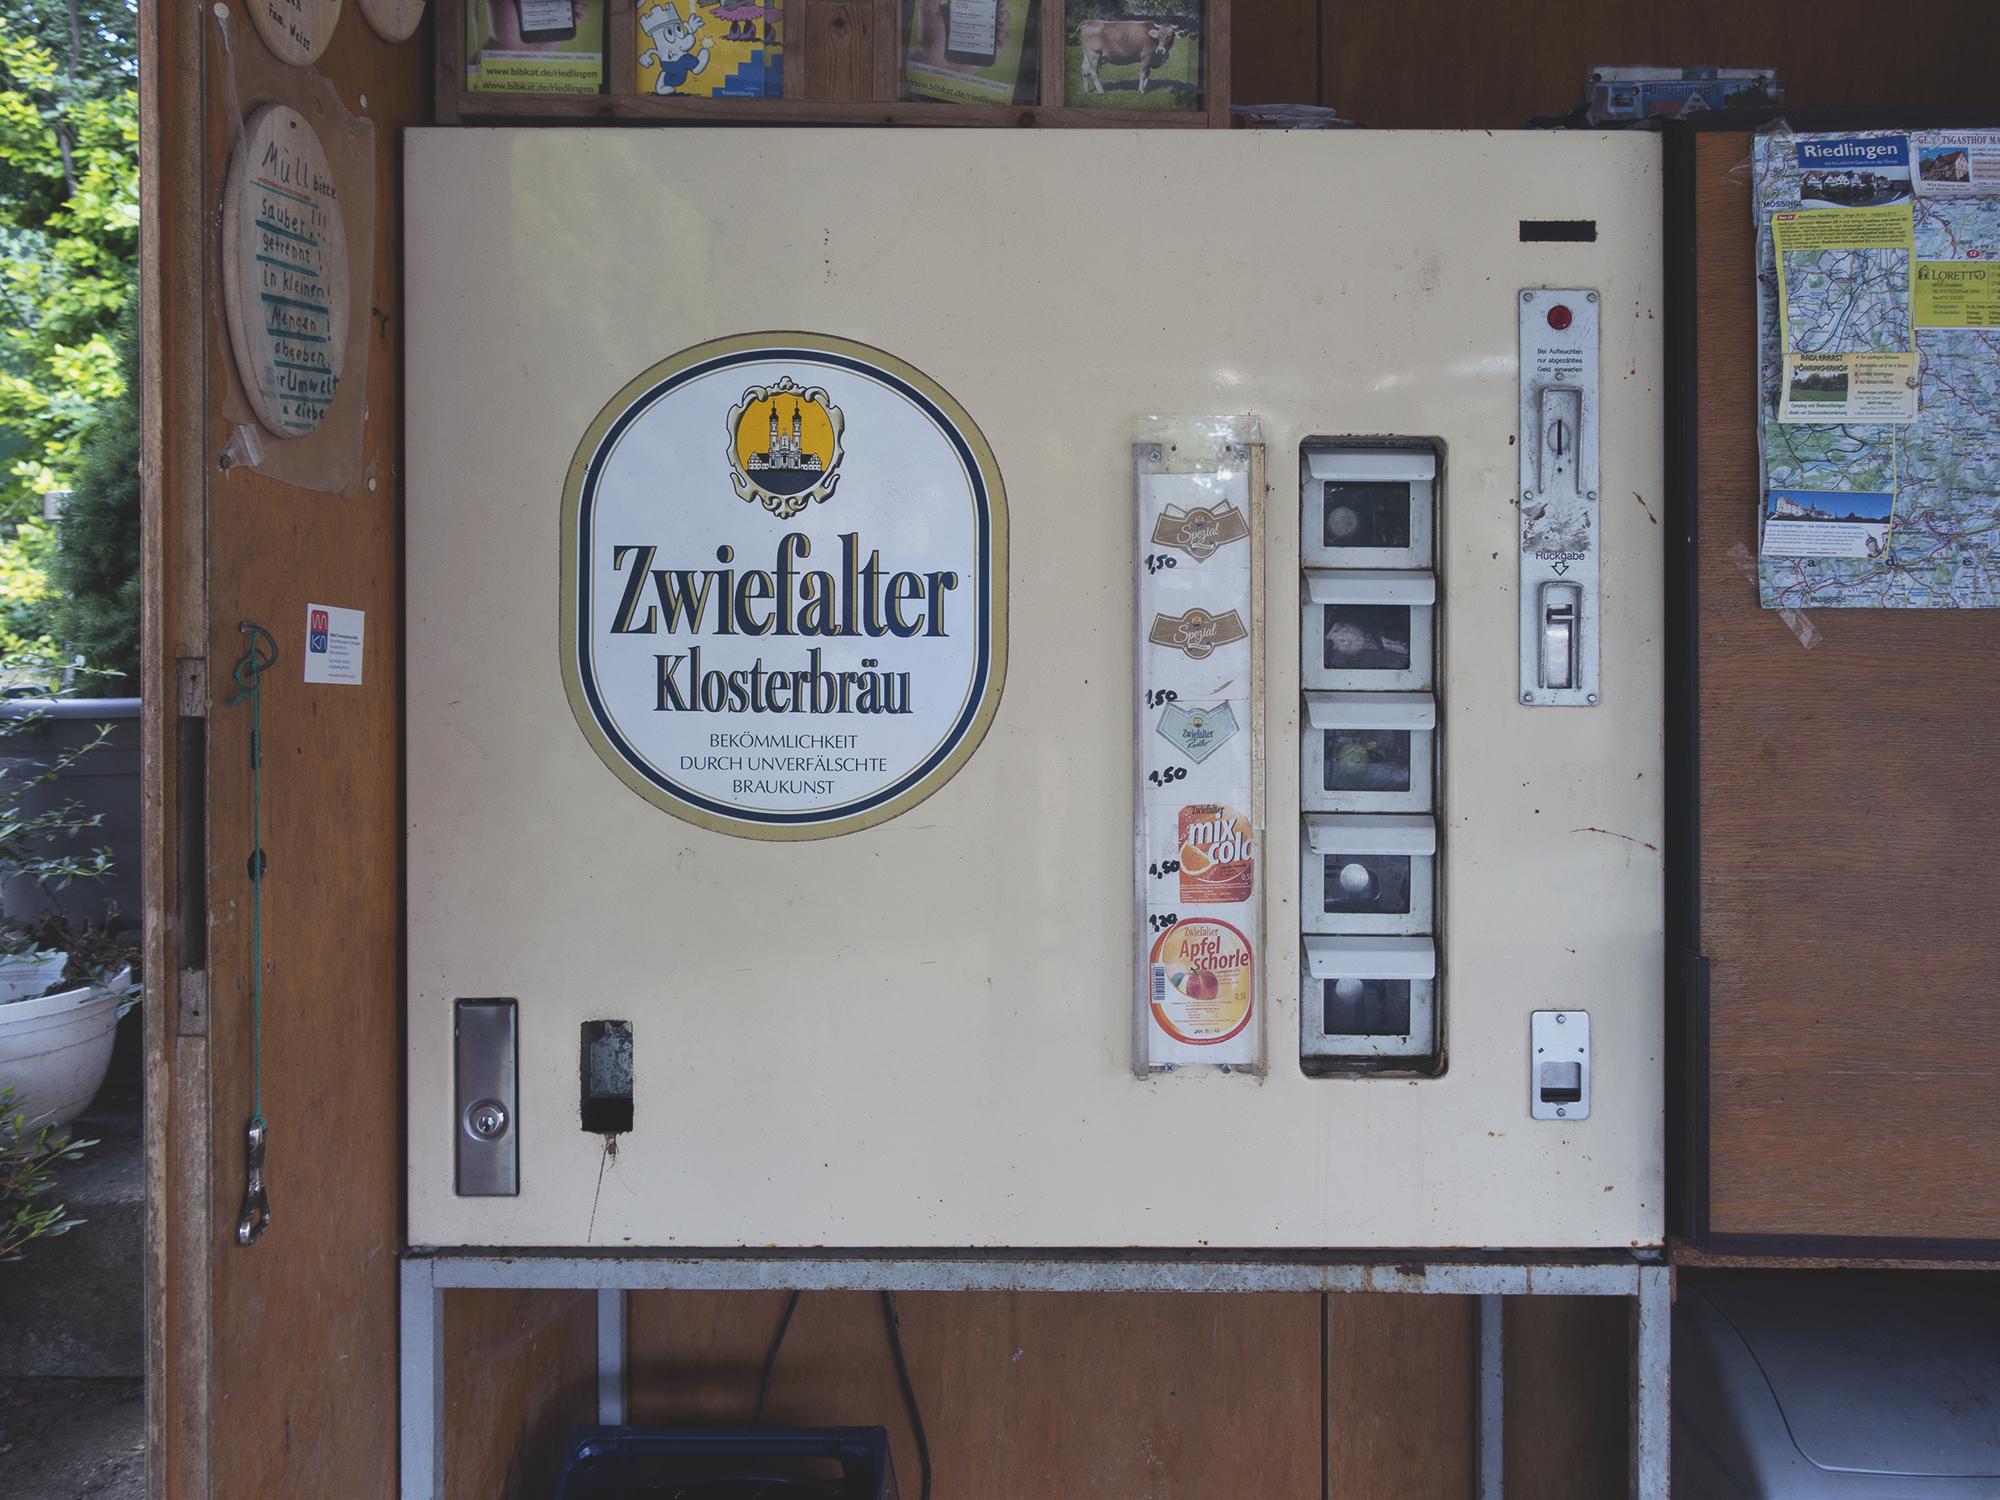 A beer vending machine!